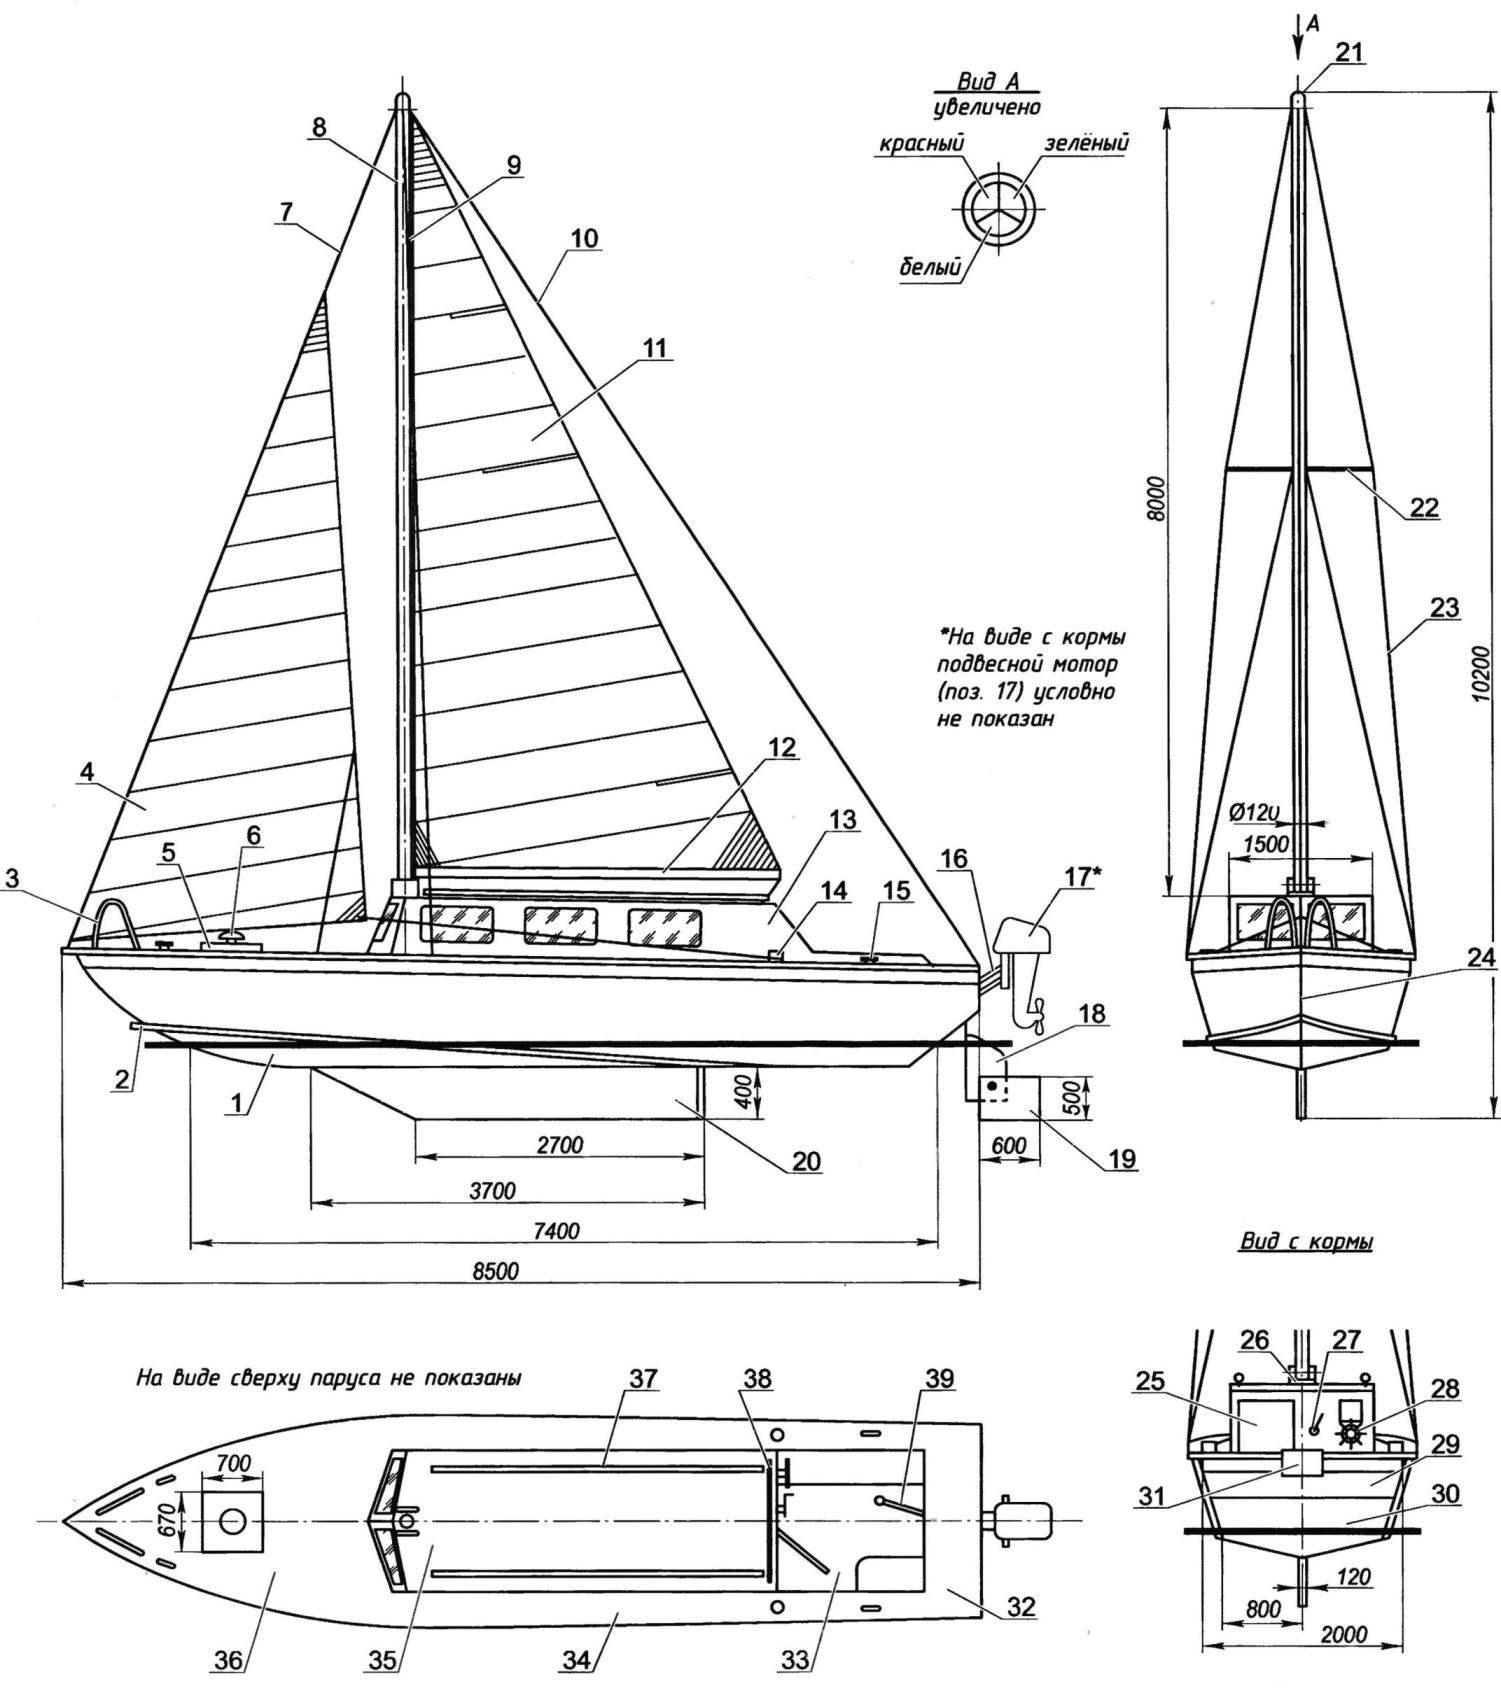 Under Sail Or Motor